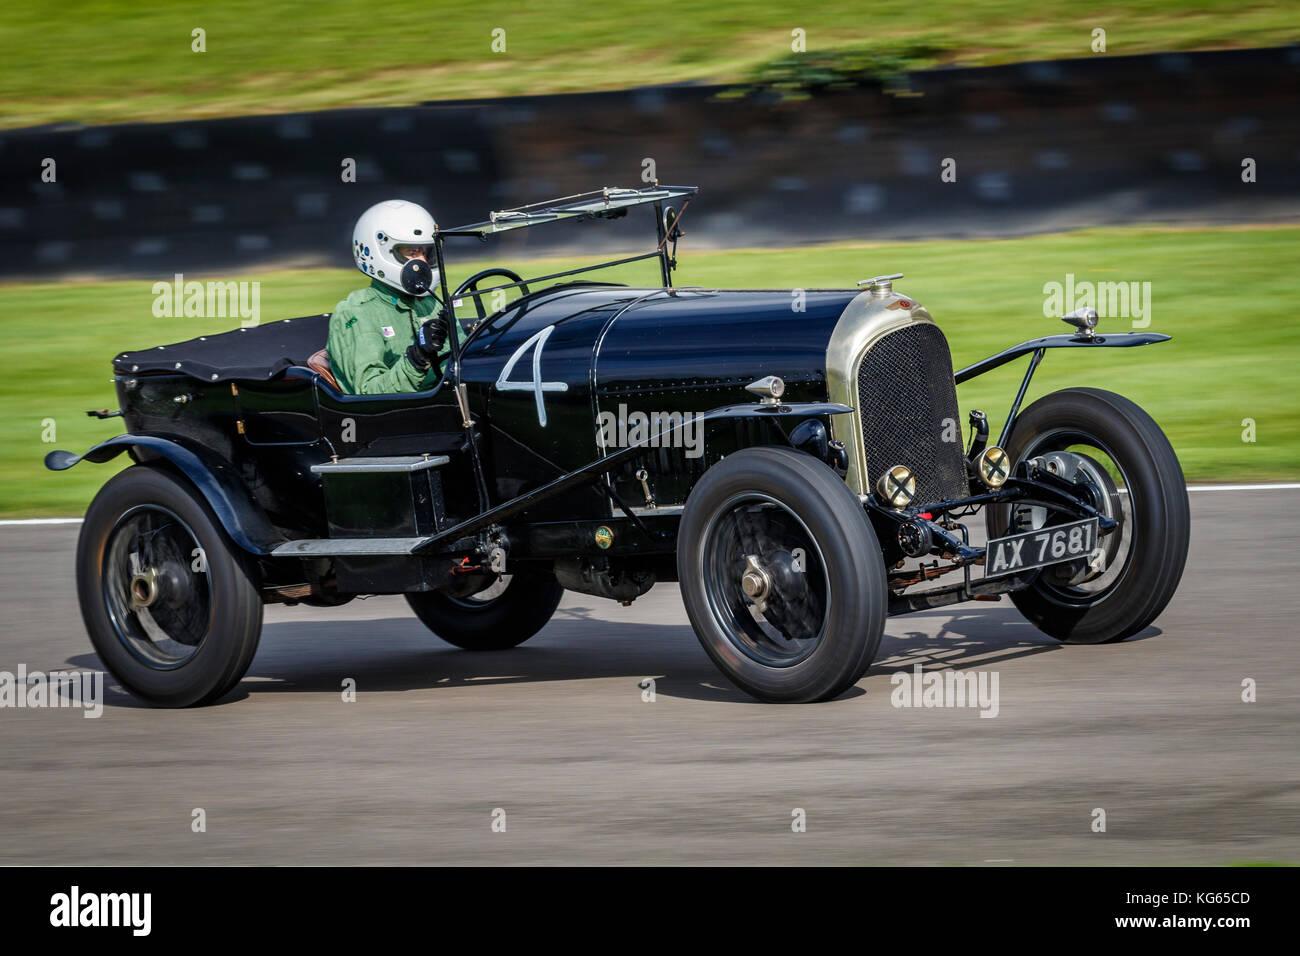 1925 Bentley speed Modell mit Fahrer ben Collings während des brooklands Trophy Rennen auf dem Goodwood Revival Stockbild